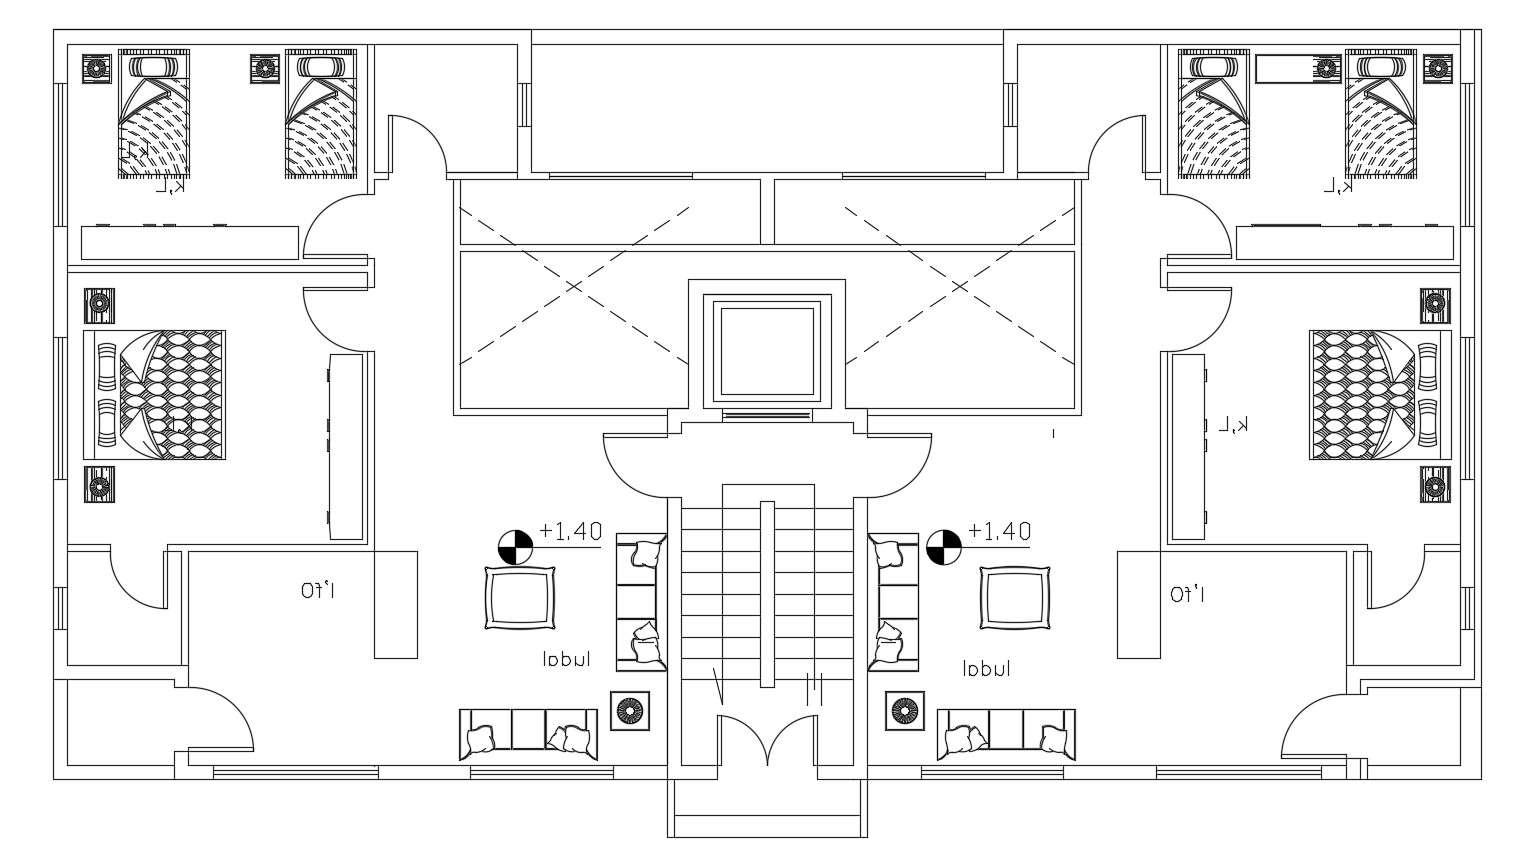 2 Bedroom Apartment Floor Plan Dwg File Cadbull